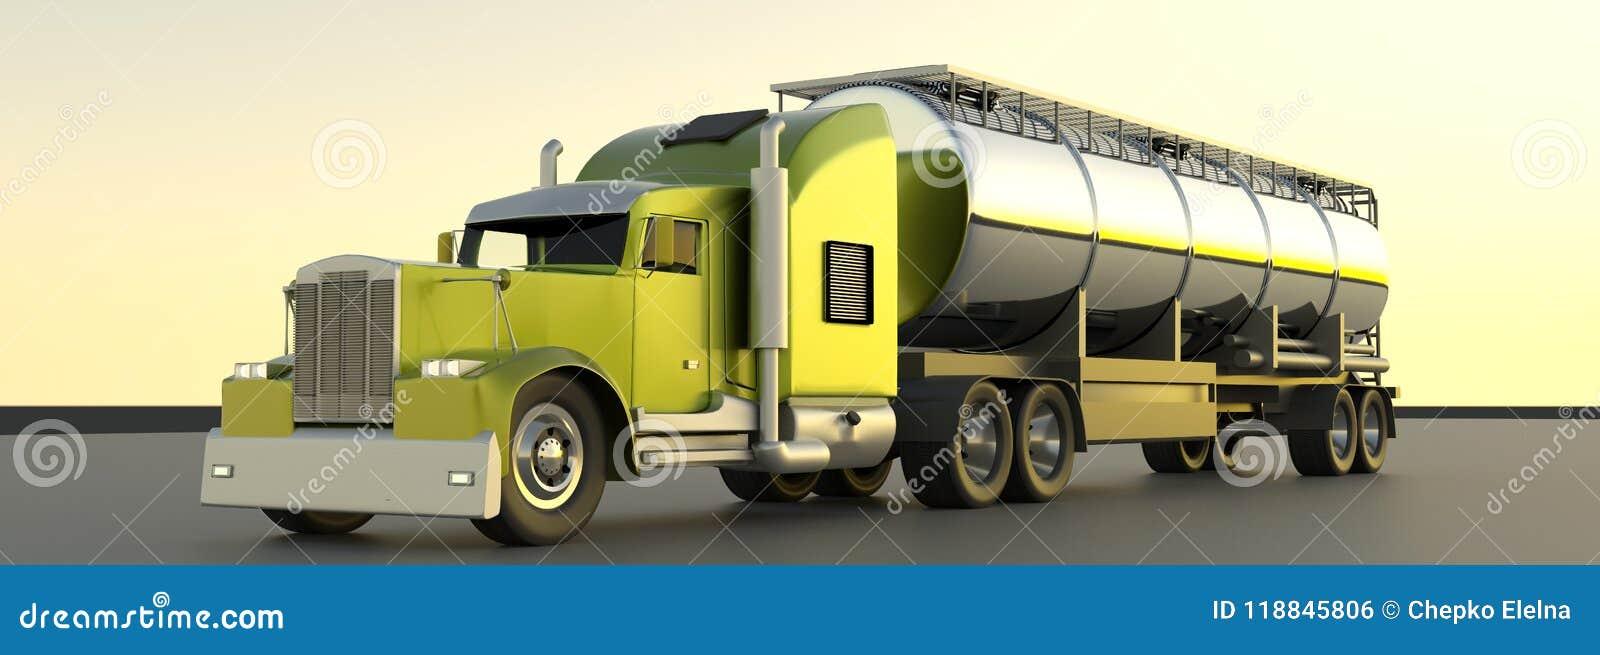 Топливозаправщик бензина перевод 3d Трейлер масла Truc топливозаправщика газа топлива